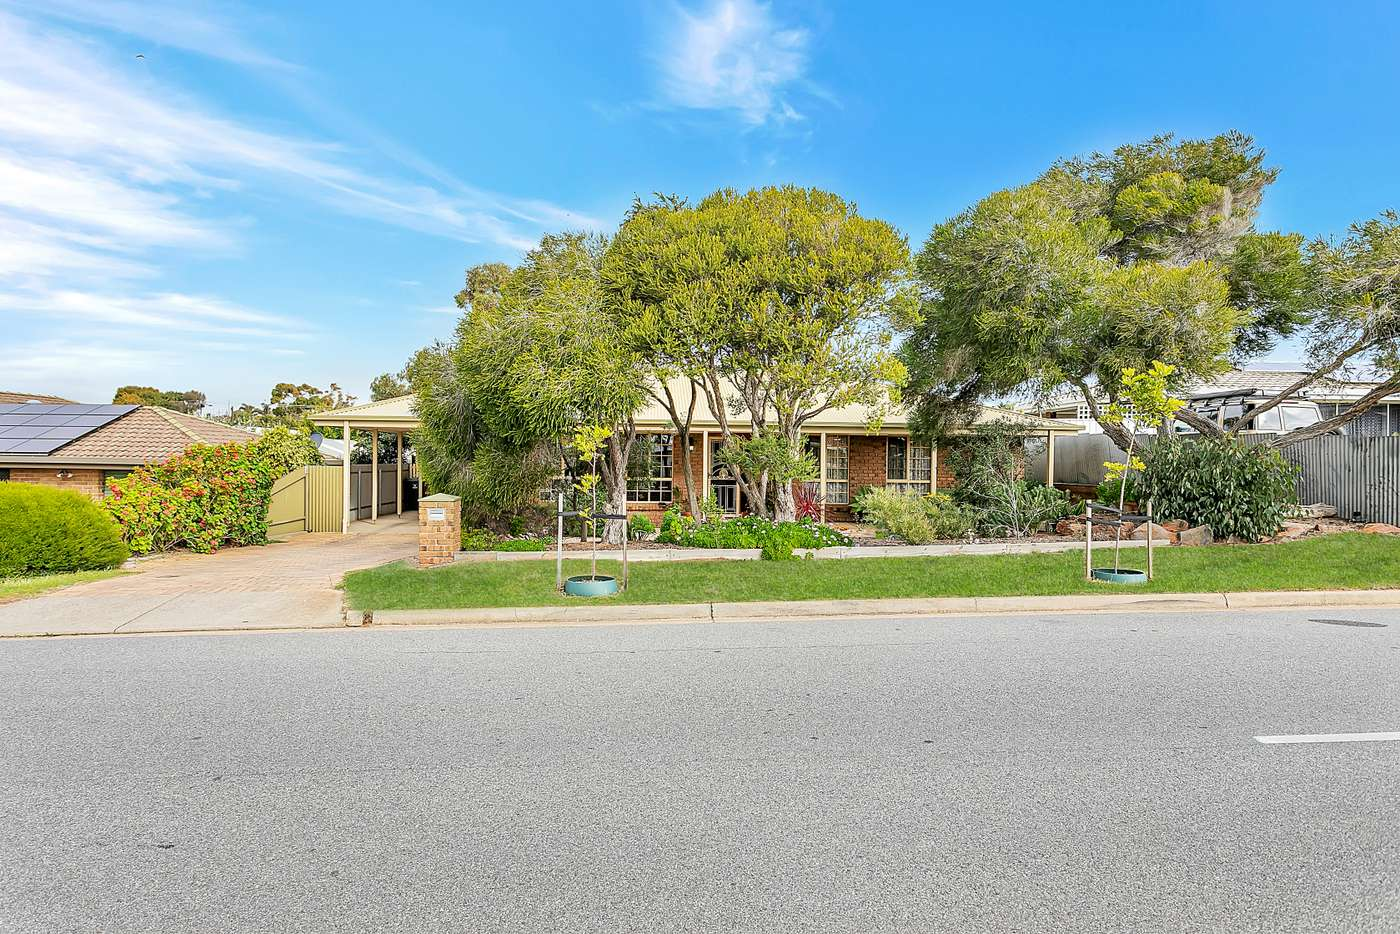 Fifth view of Homely house listing, 20 Macquarie Street, Moana SA 5169